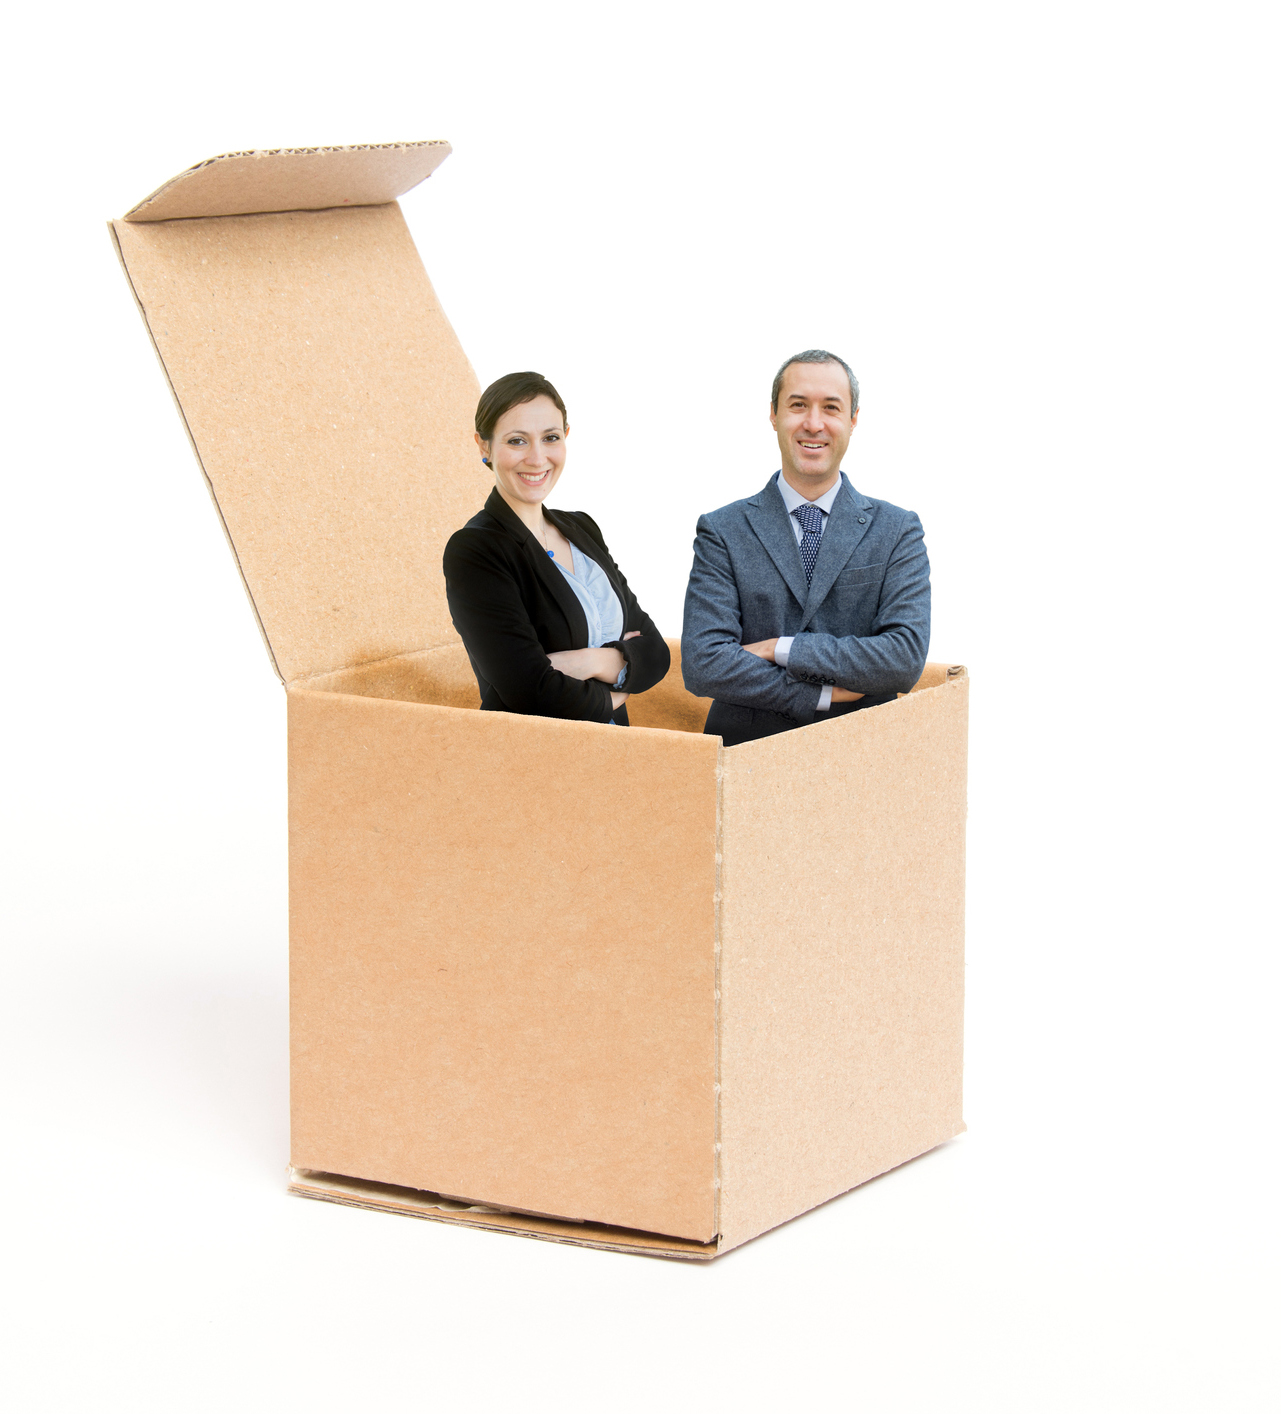 Carton Manufacturing Services